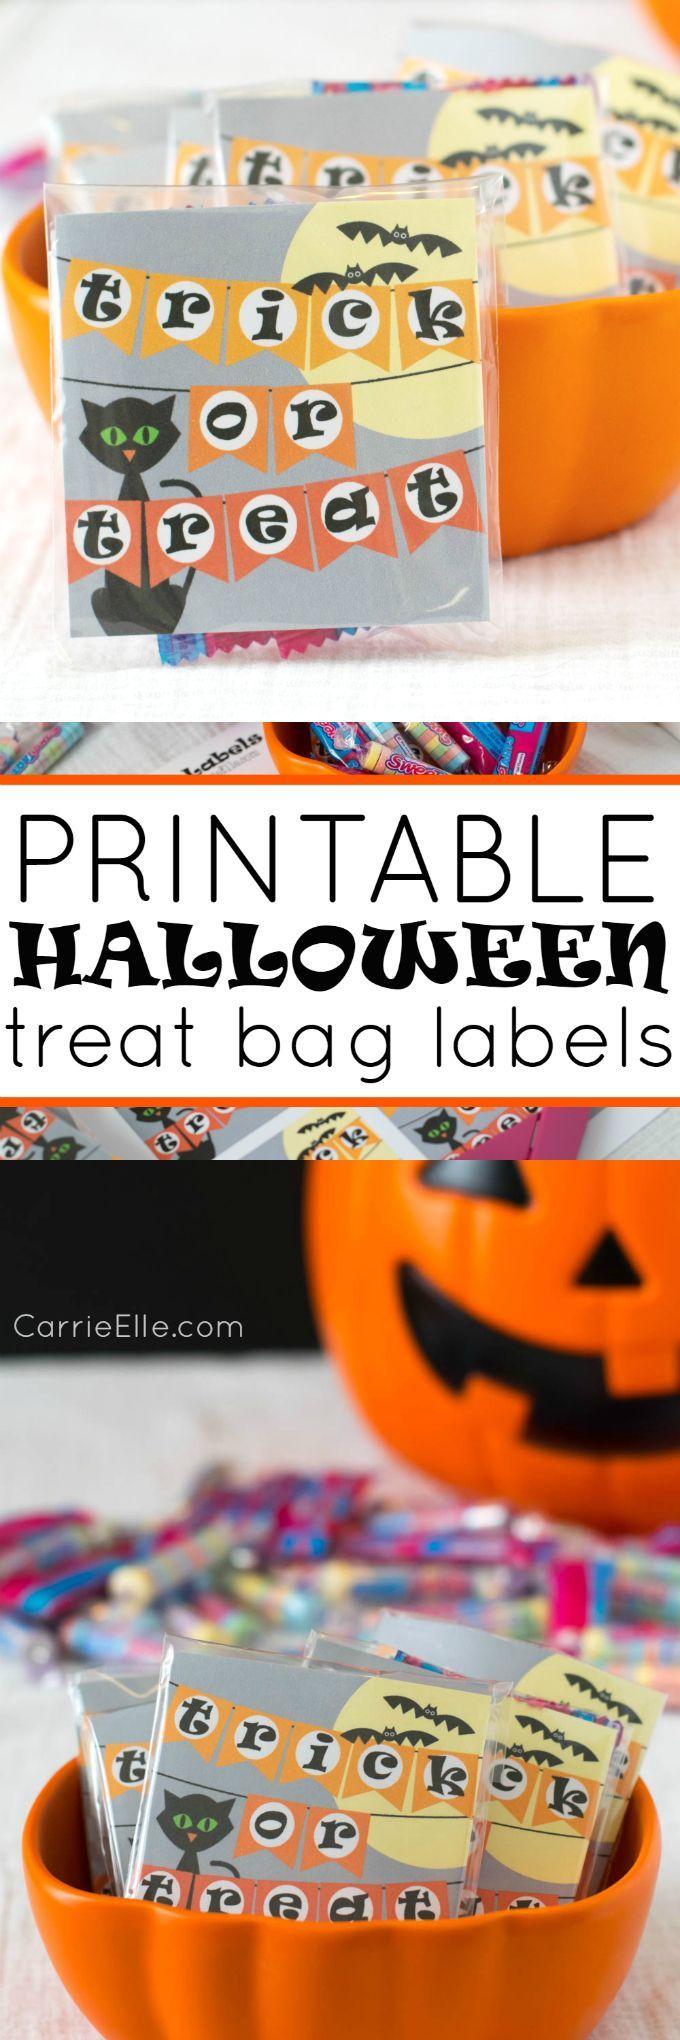 printable halloween treat bag labels